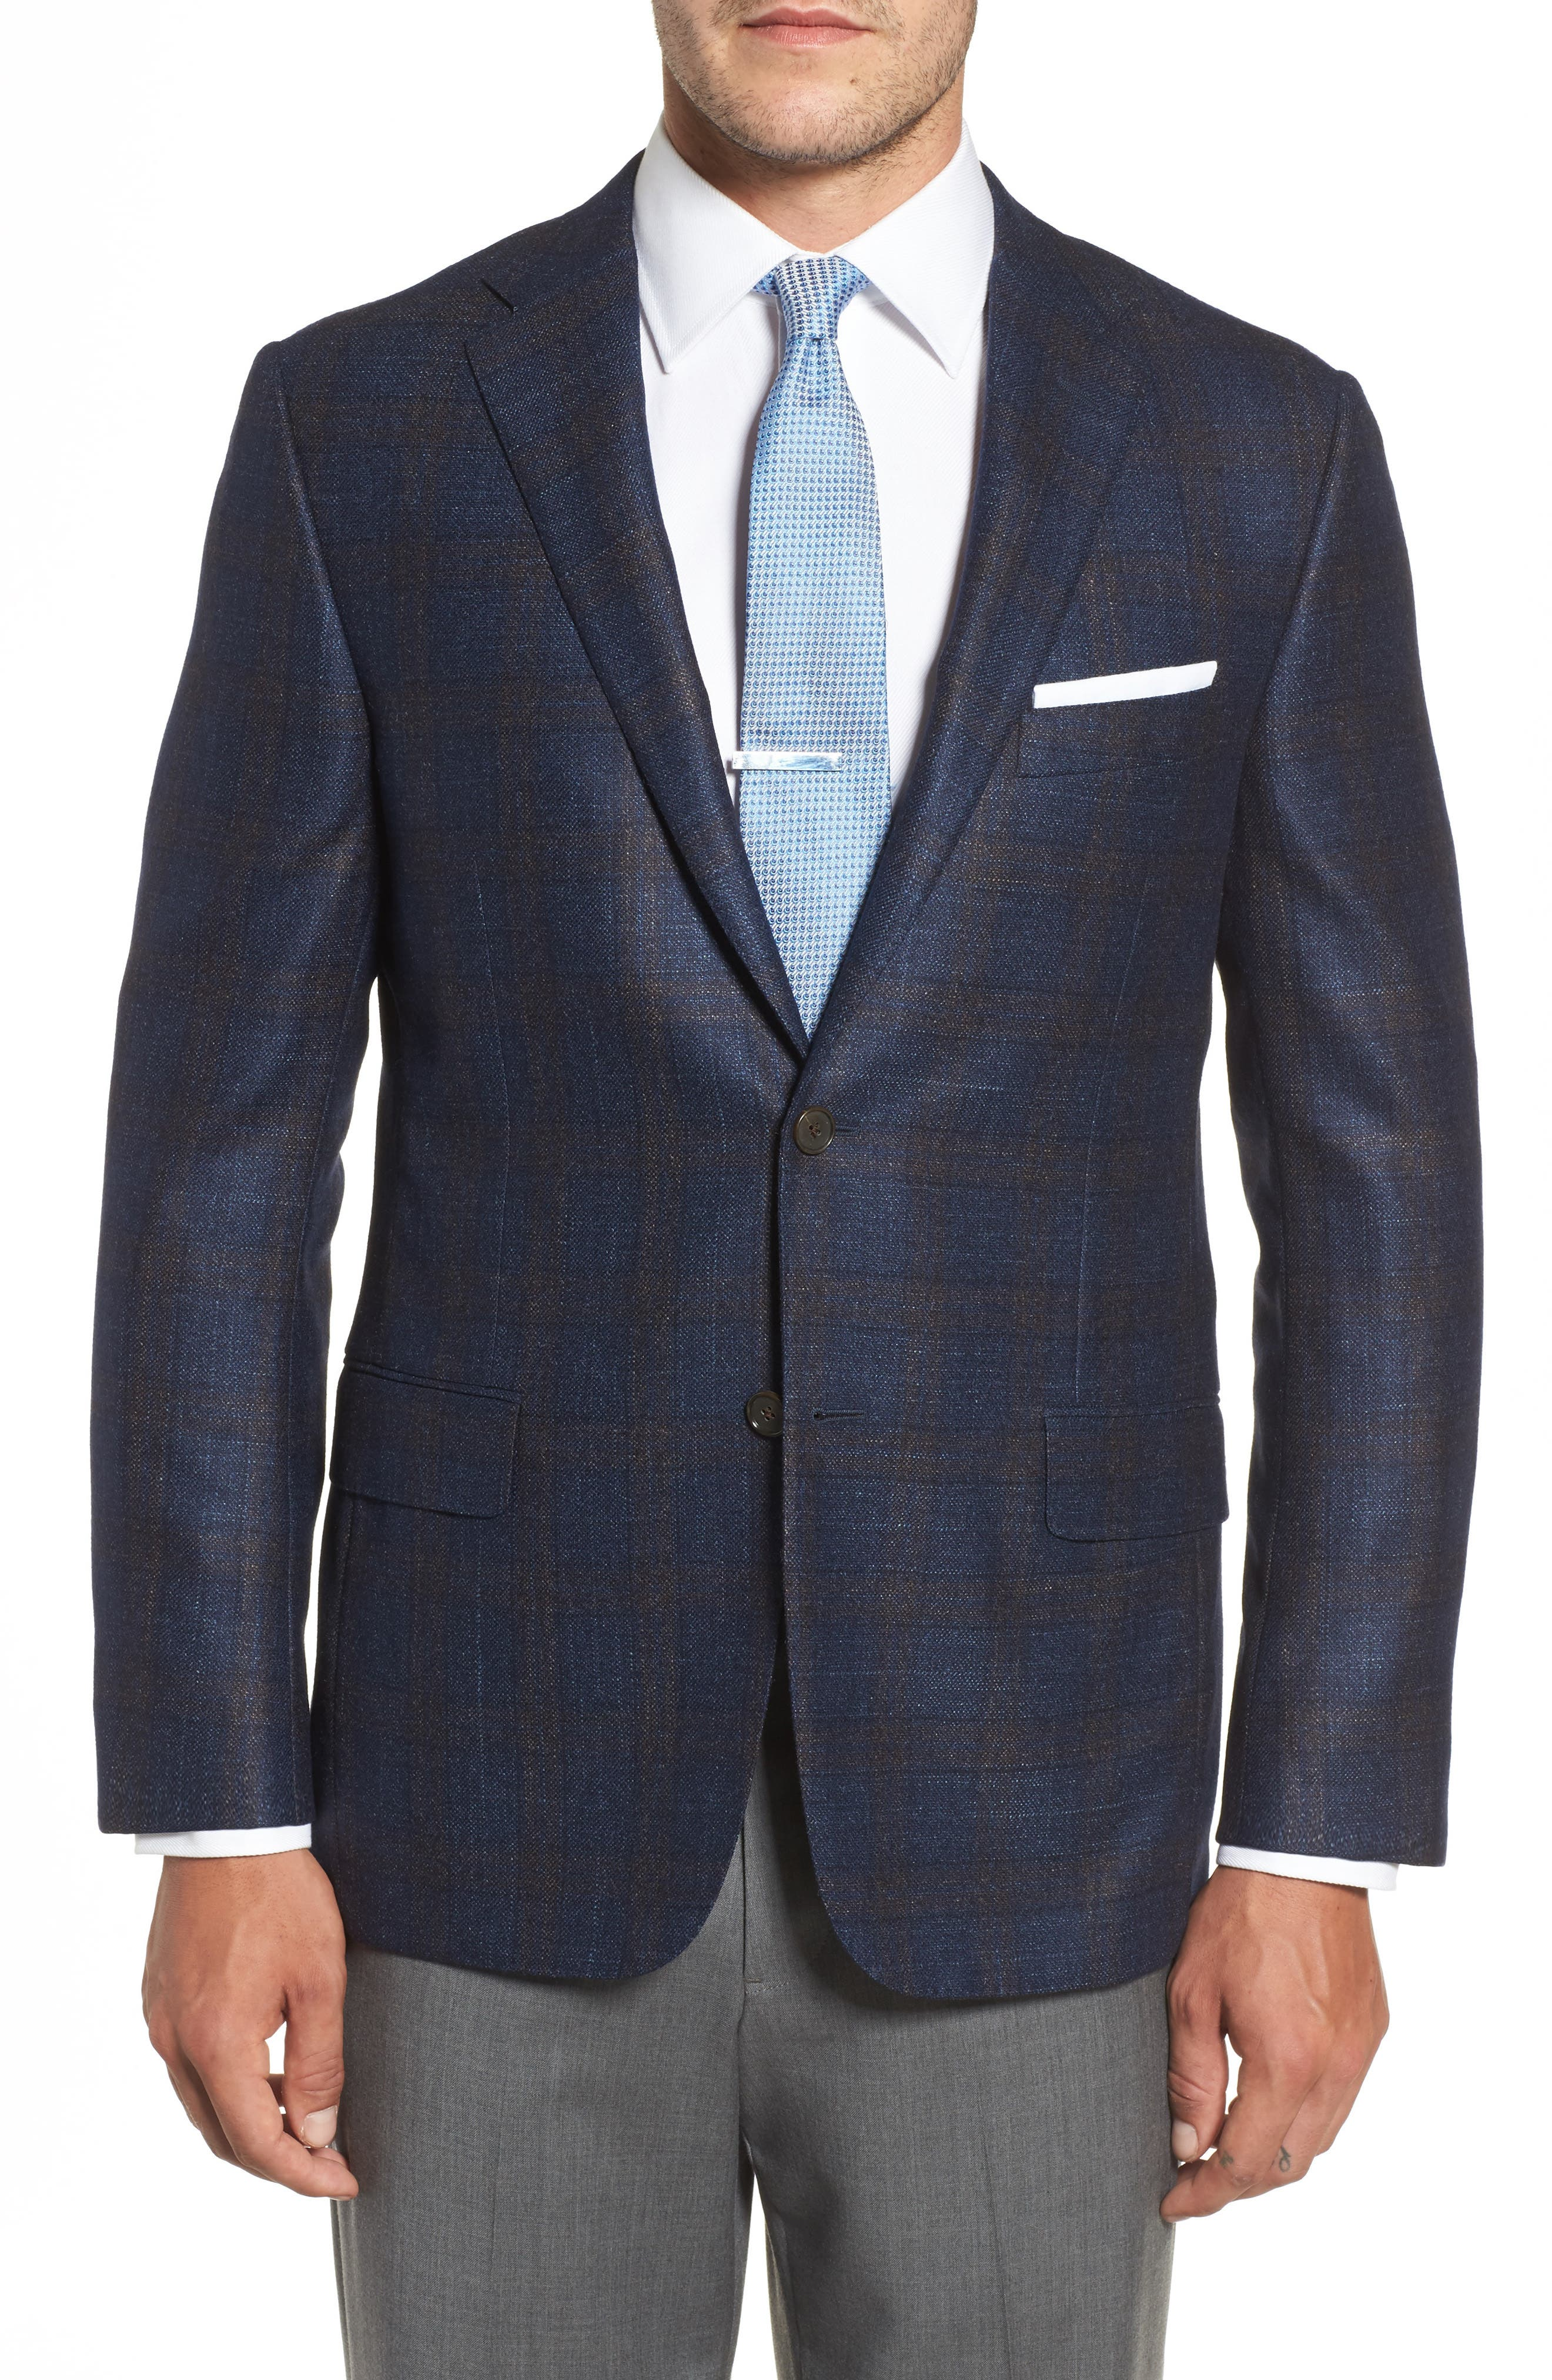 Main Image - Hickey Freeman Classic B Fit Plaid Wool Blend Sport Coat